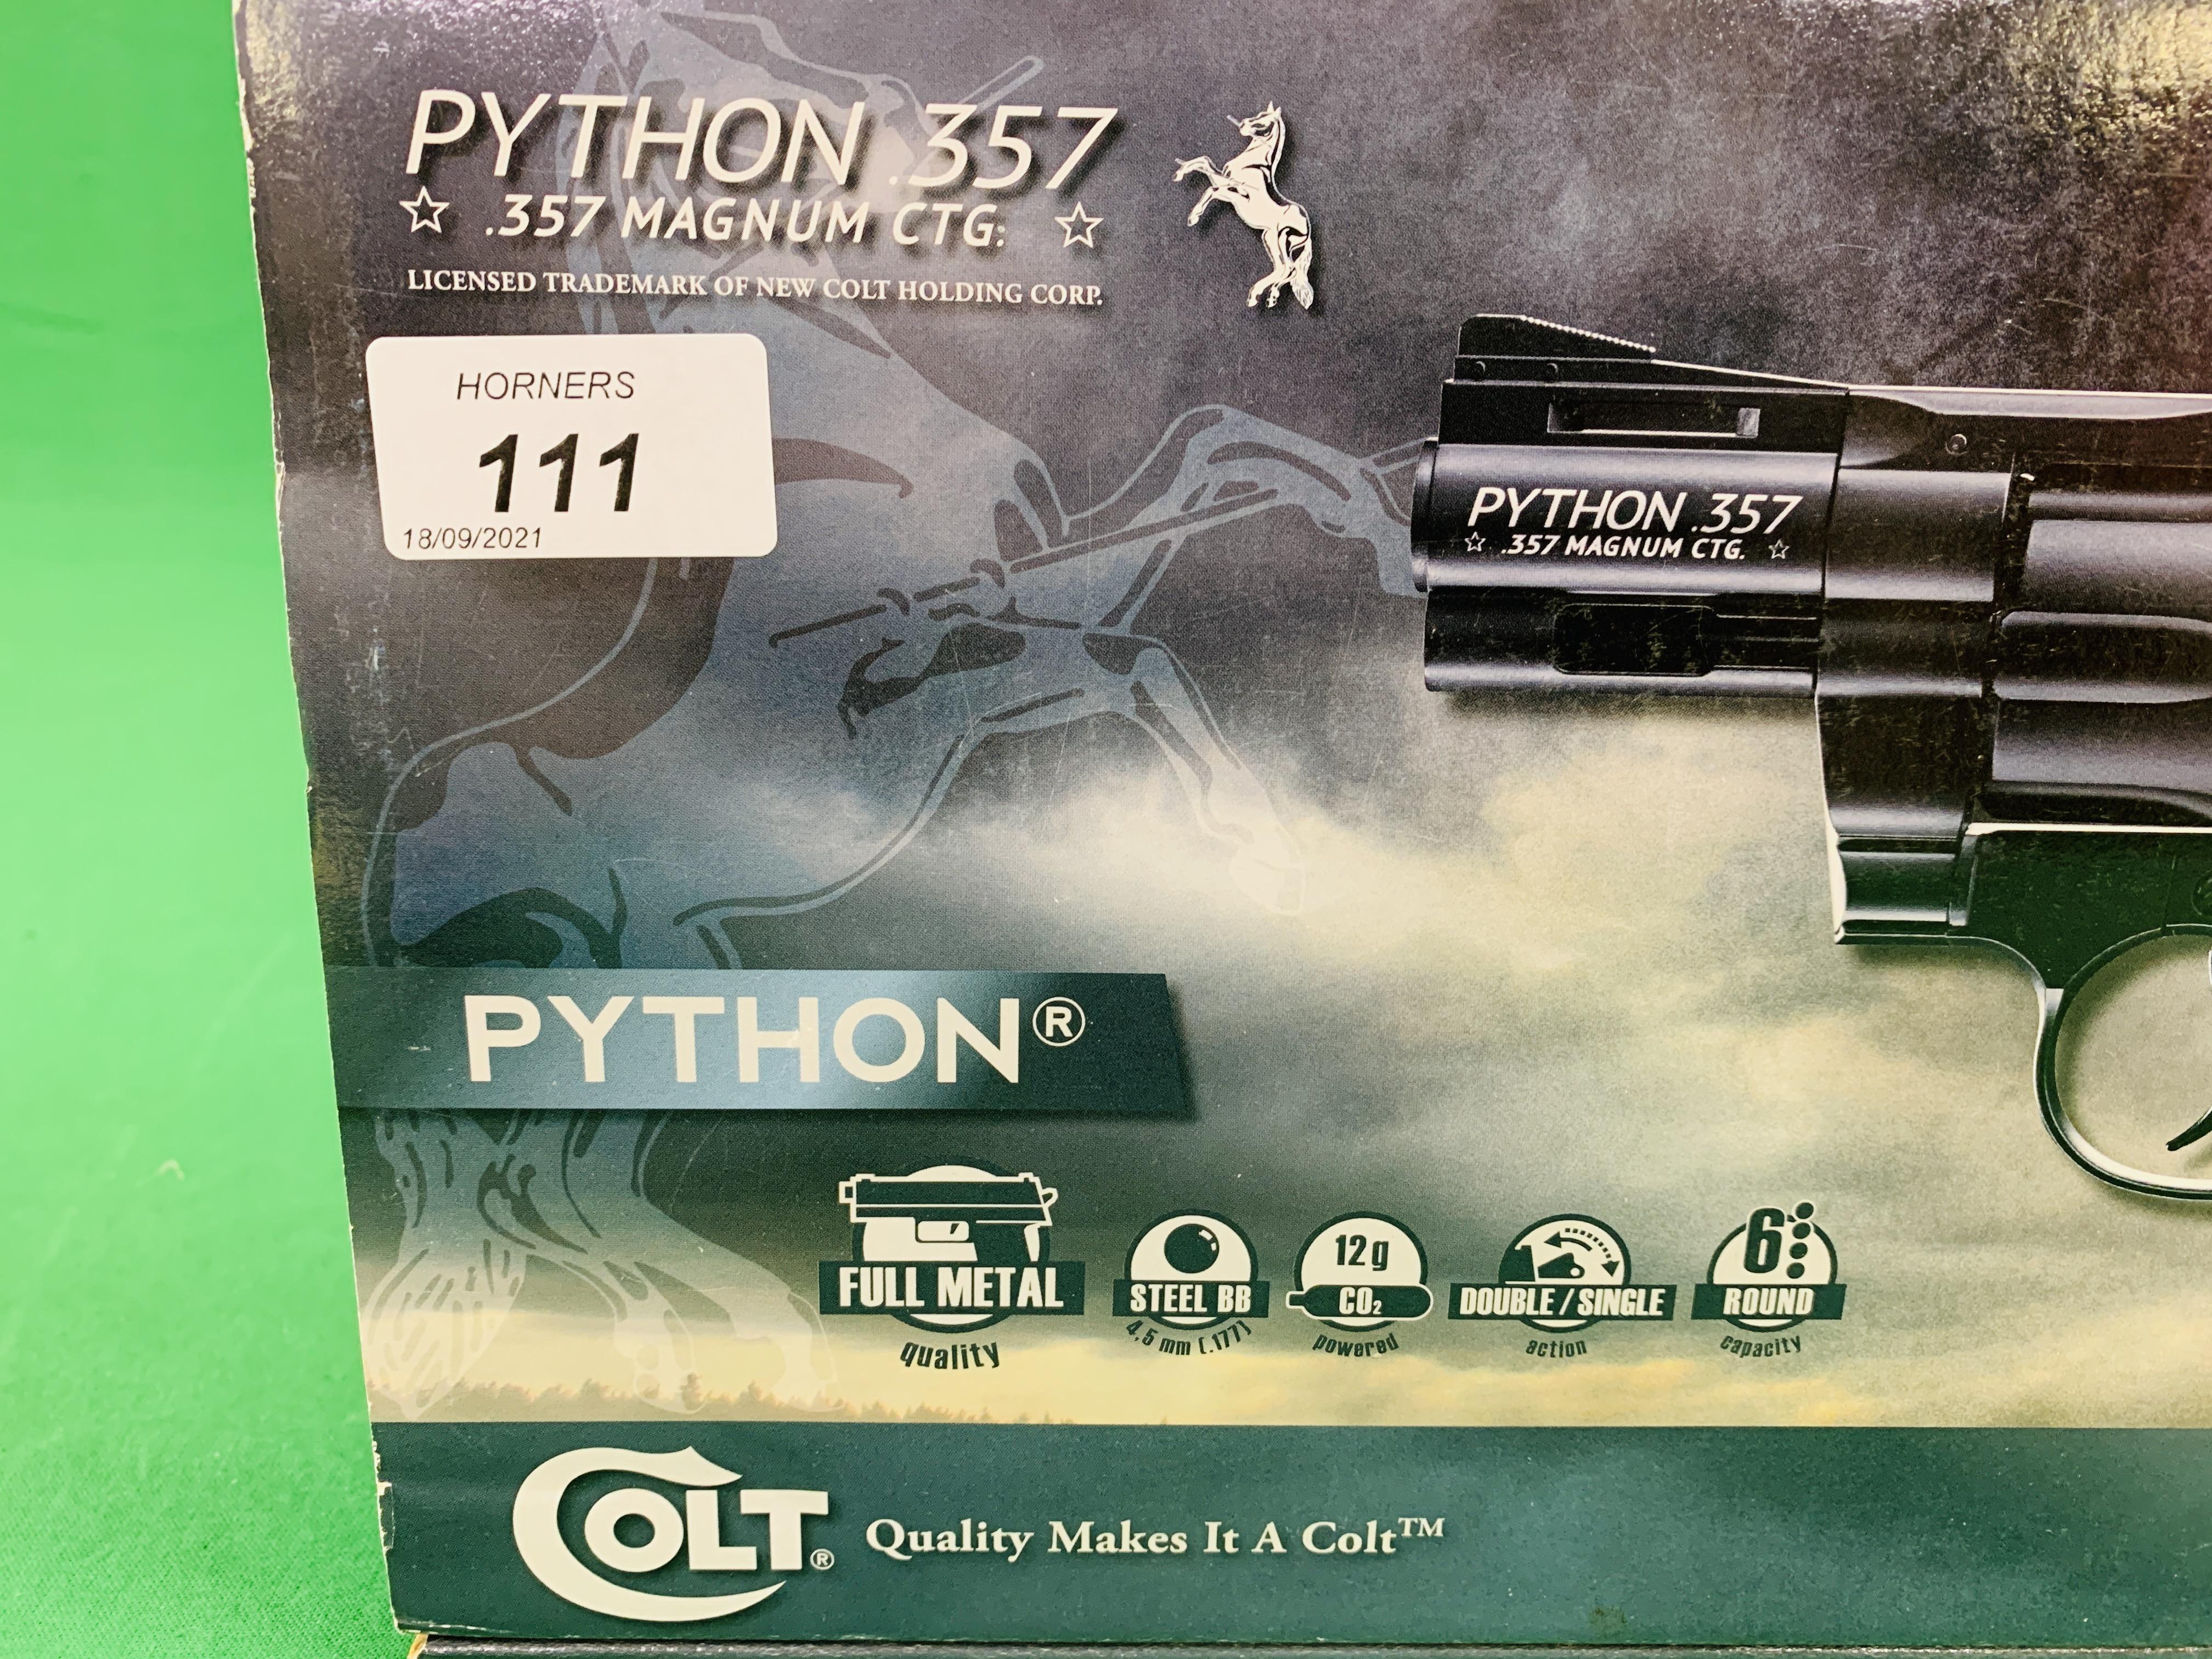 A COLT PYTHON 2. - Image 3 of 10